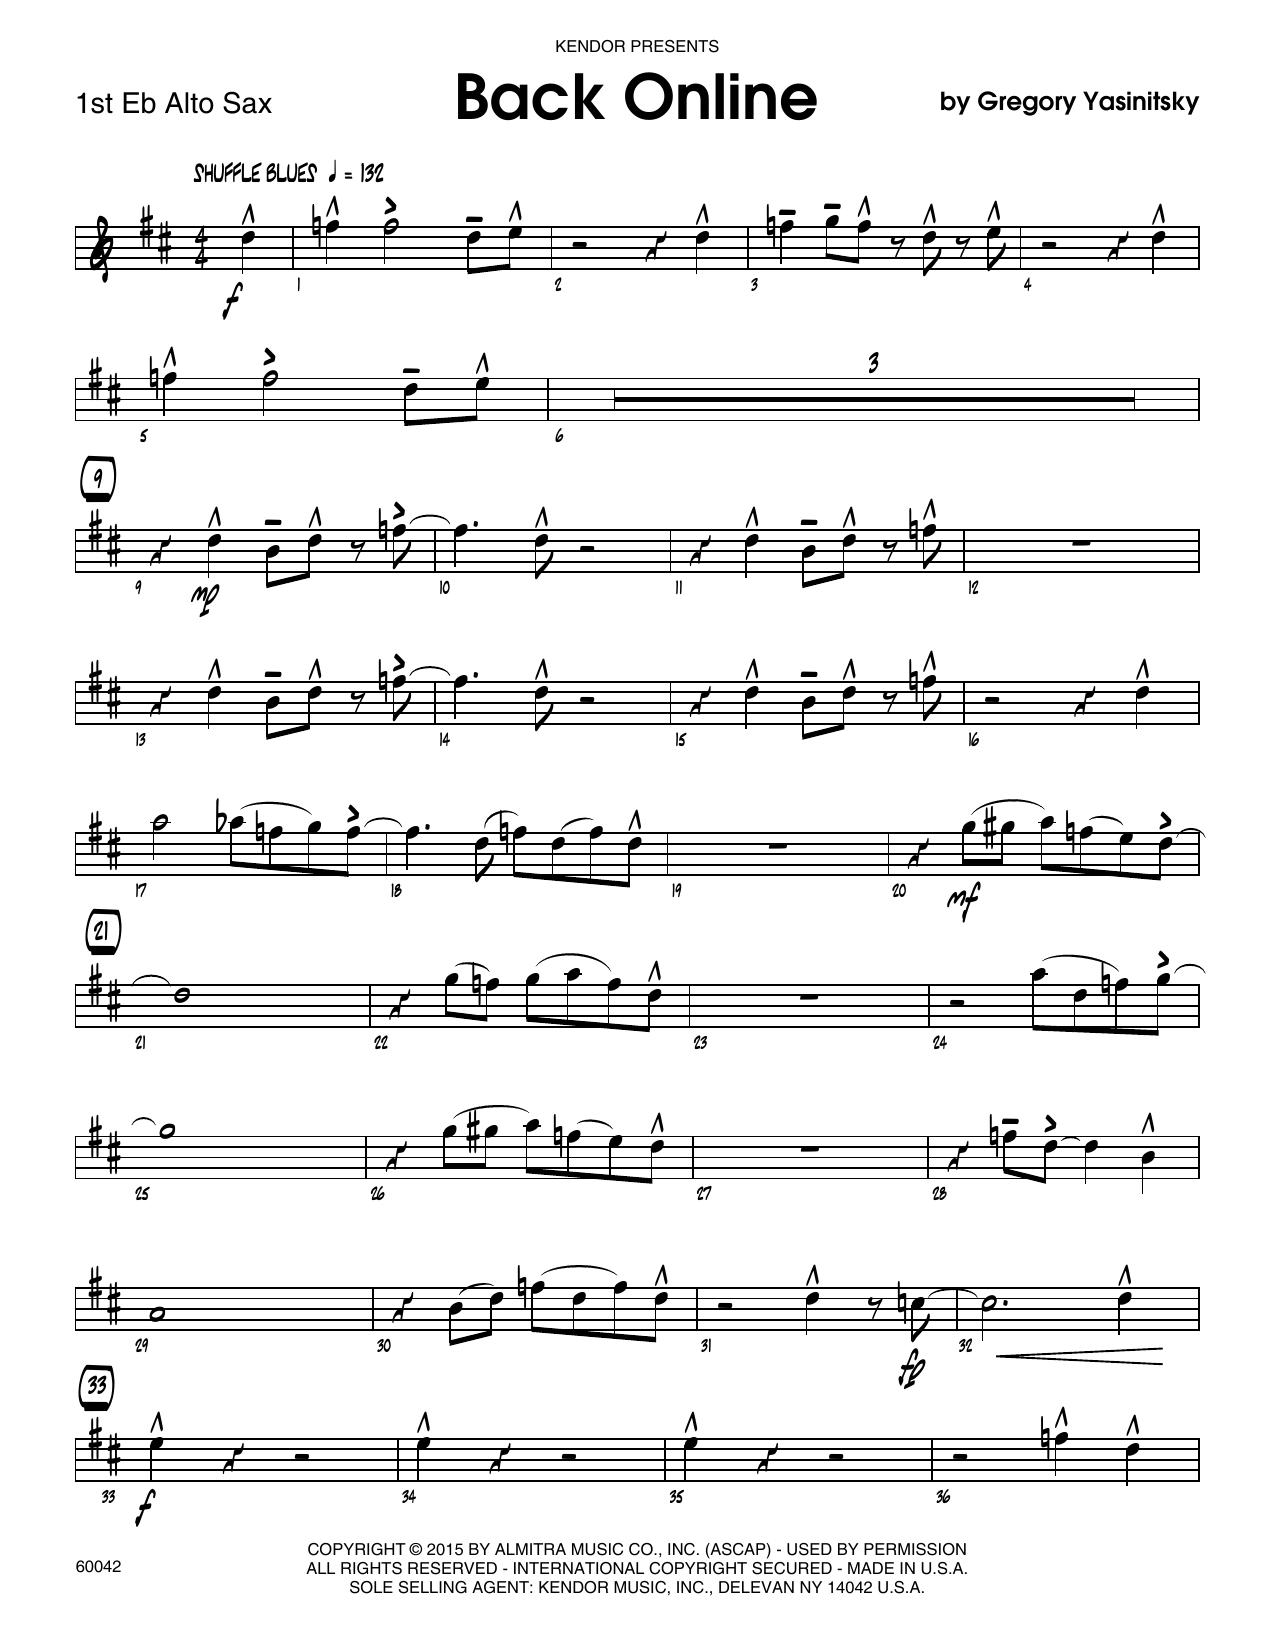 Back Online - 1st Eb Alto Saxophone Sheet Music